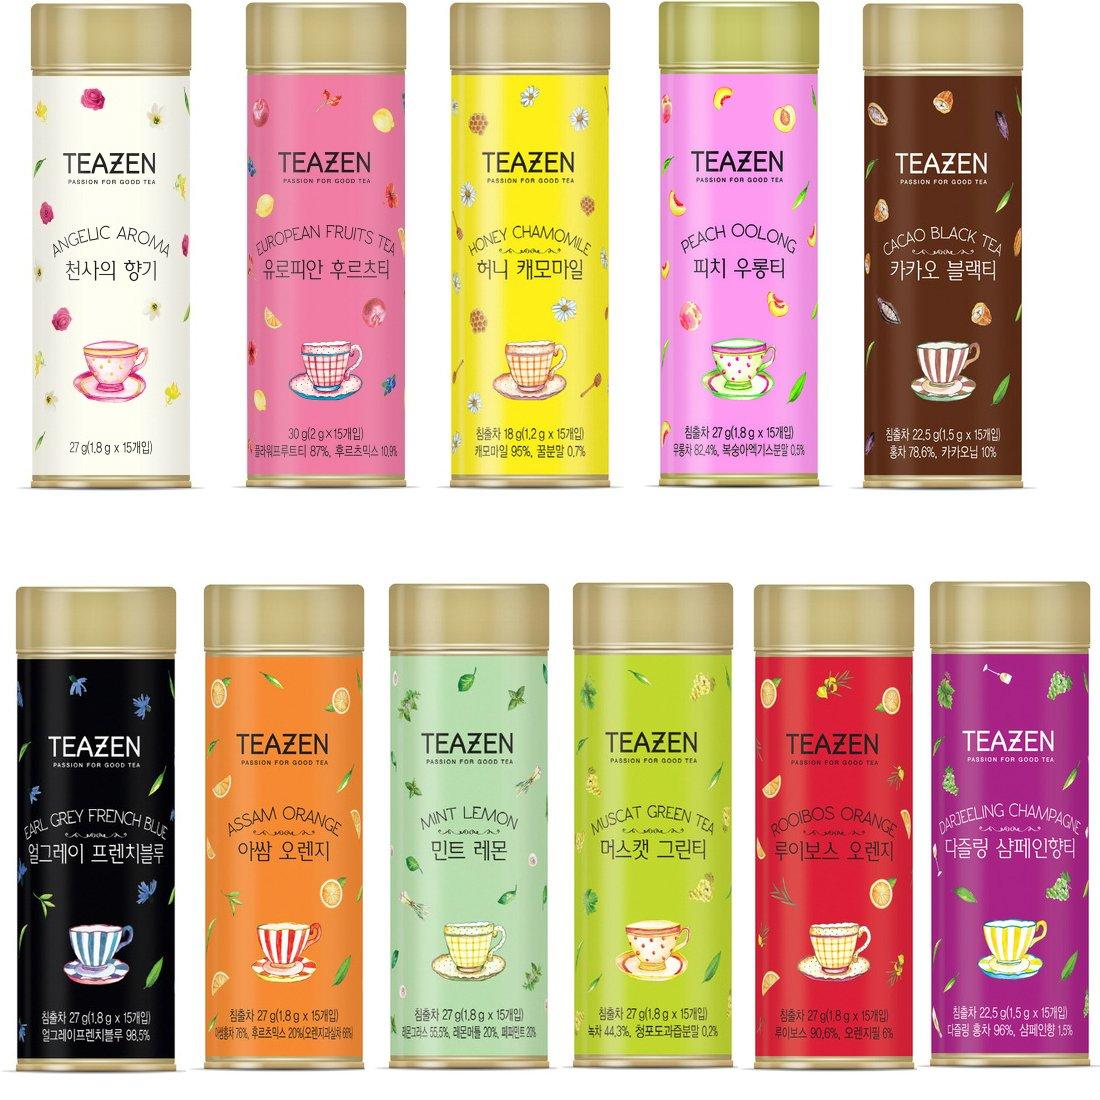 TEAZEN 165 Blended Tea Bags Each Flavor Tea 15ea 11 Diffrent Flavor(Jasmine Rose Cacao Peach Hibiscus Darjeeling Muscat Rooibos Chamomile Orange Mint Earl Grey)